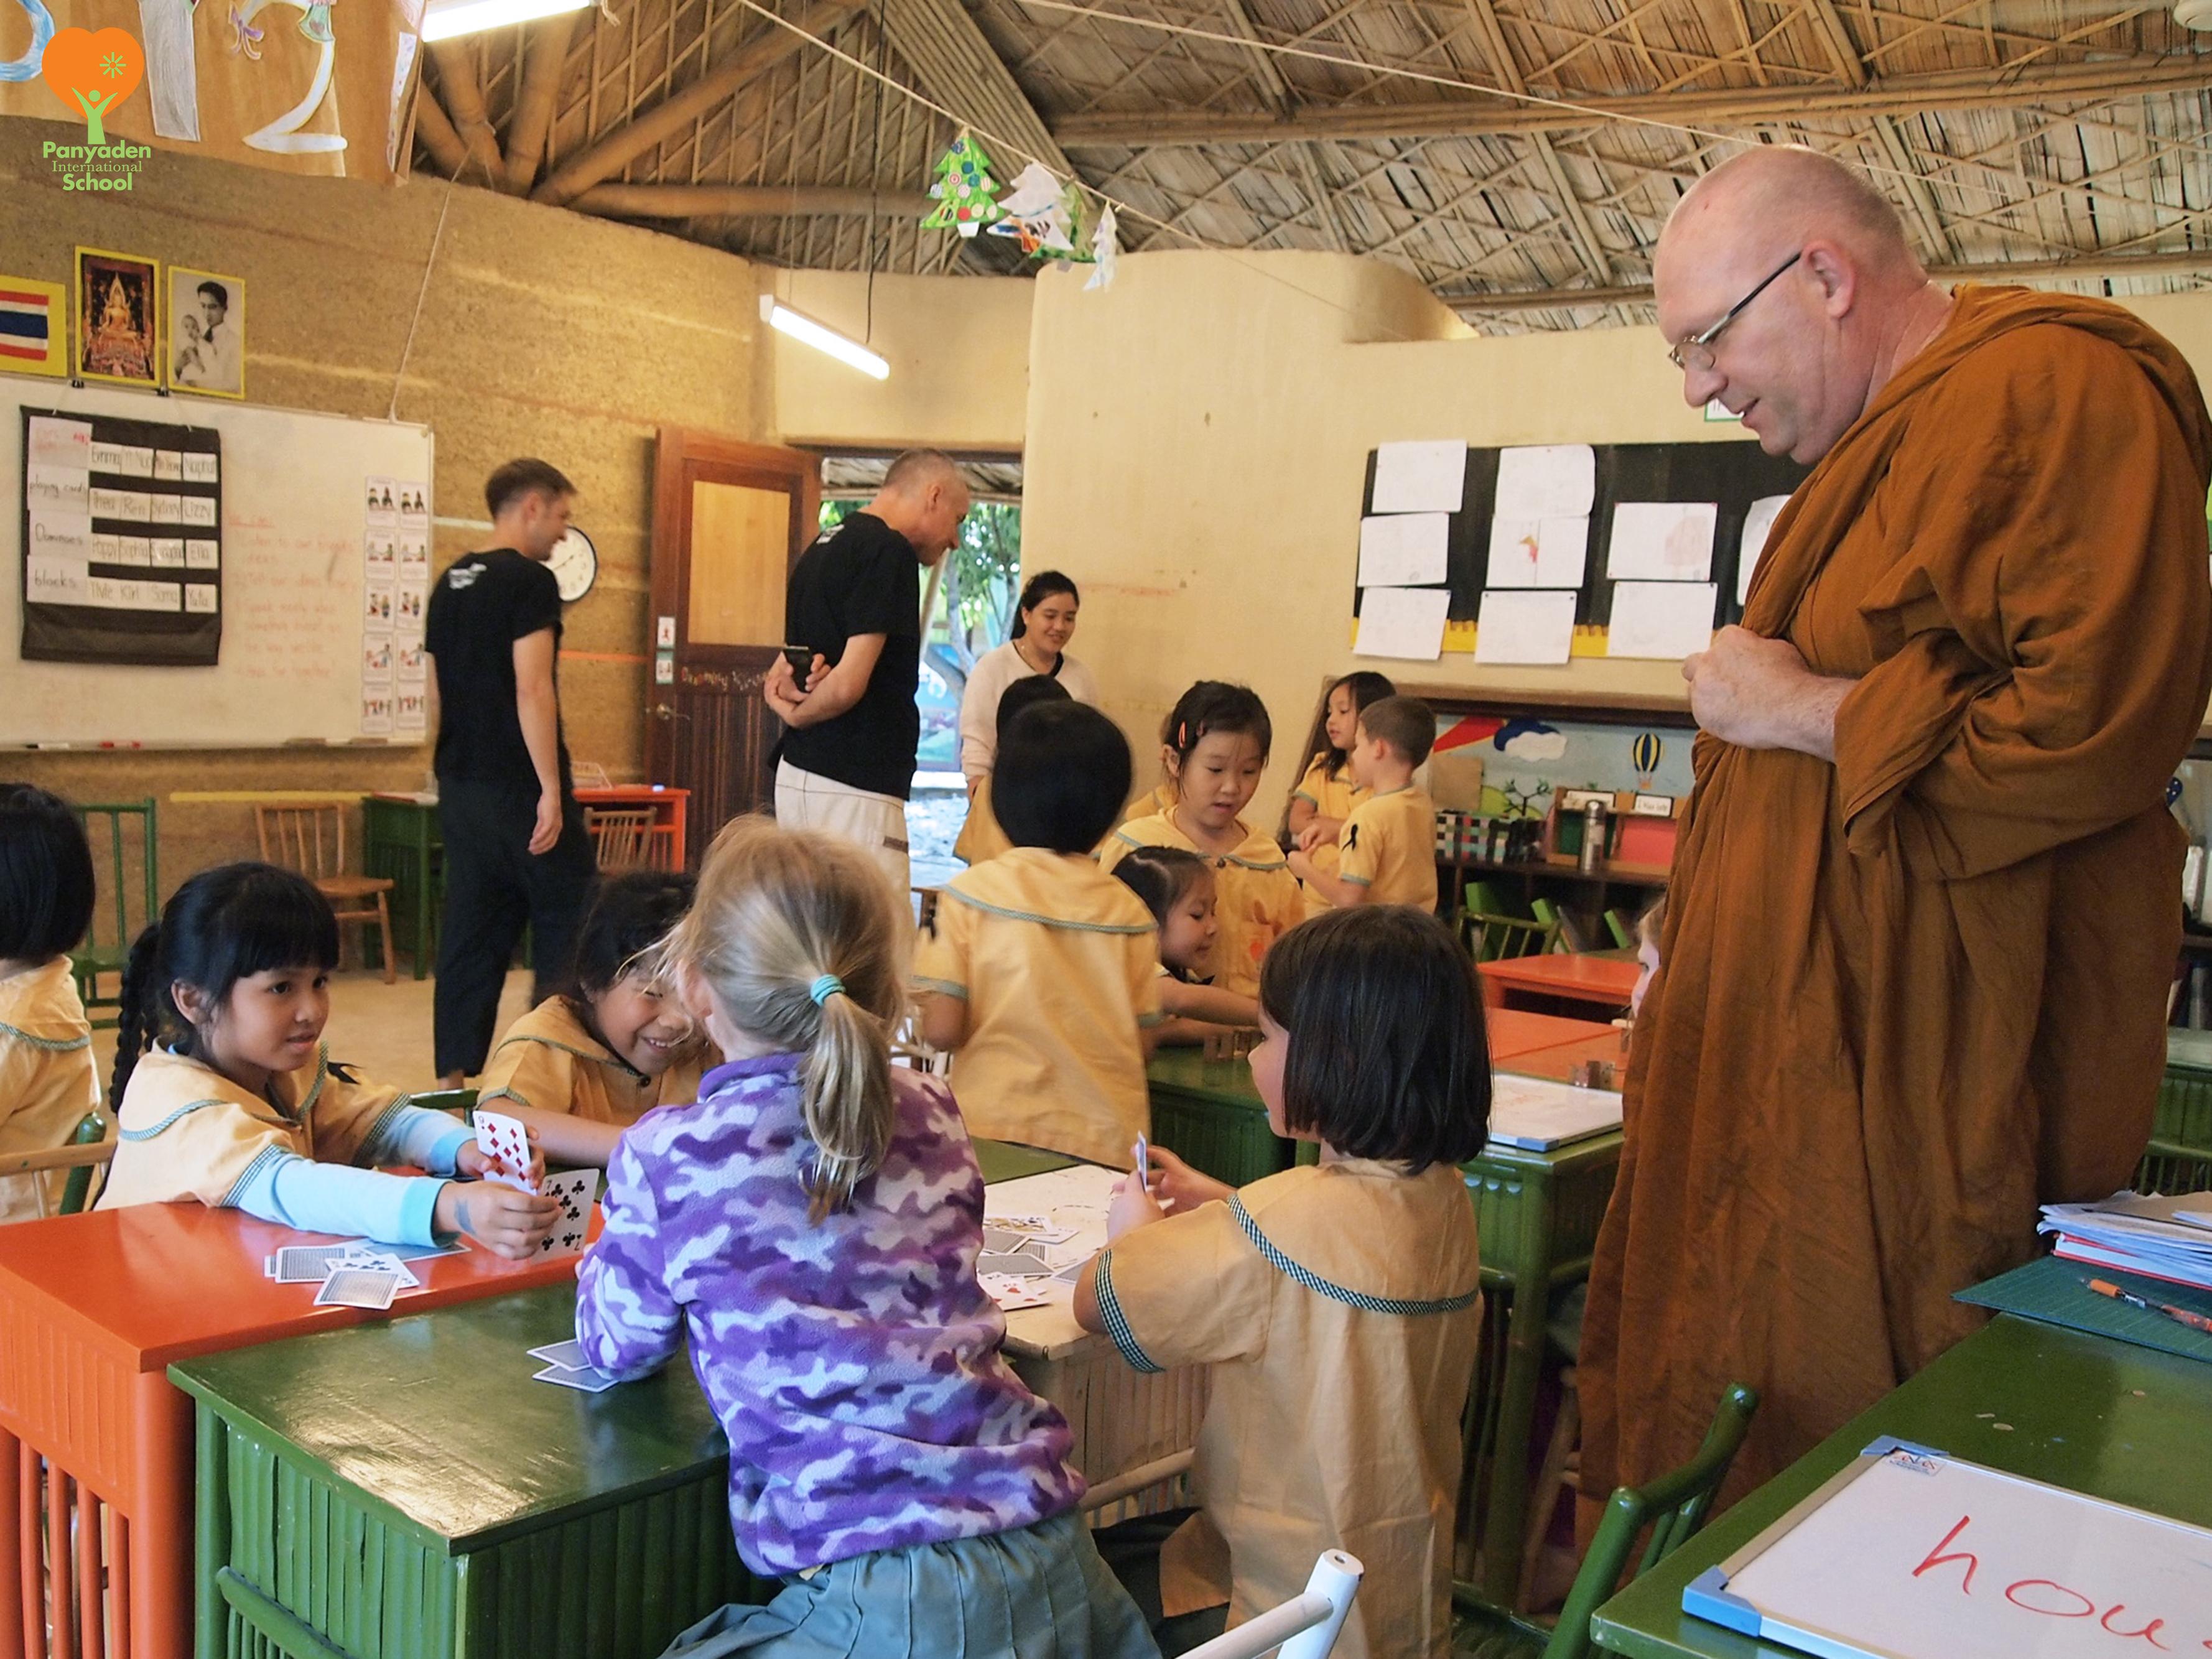 Ven. Ajahn Sukhacitto visits Panyaden International School